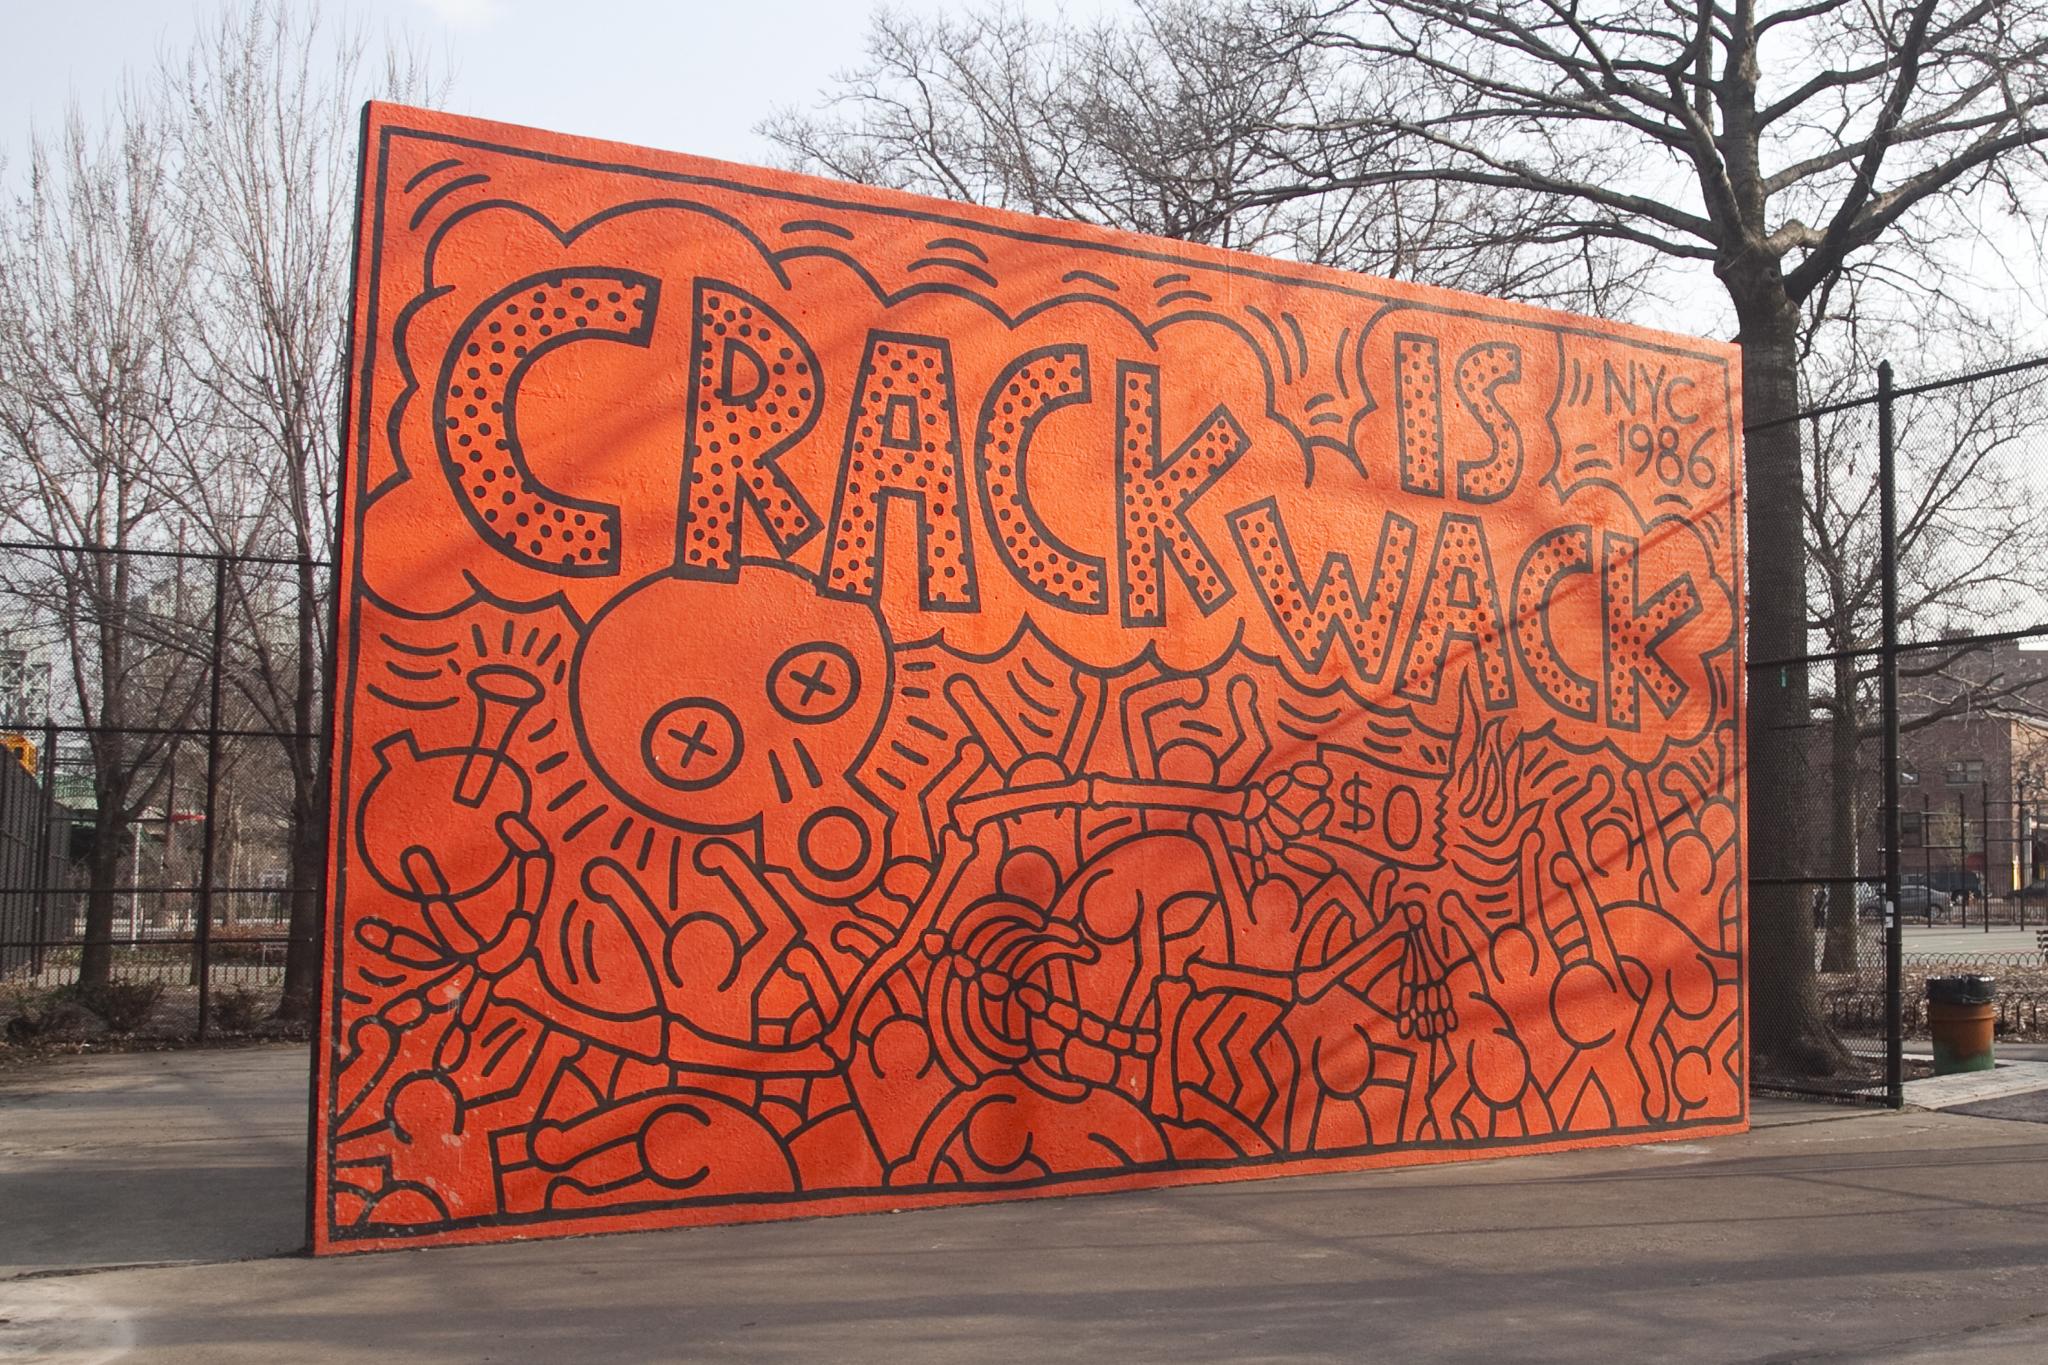 Iconic public art